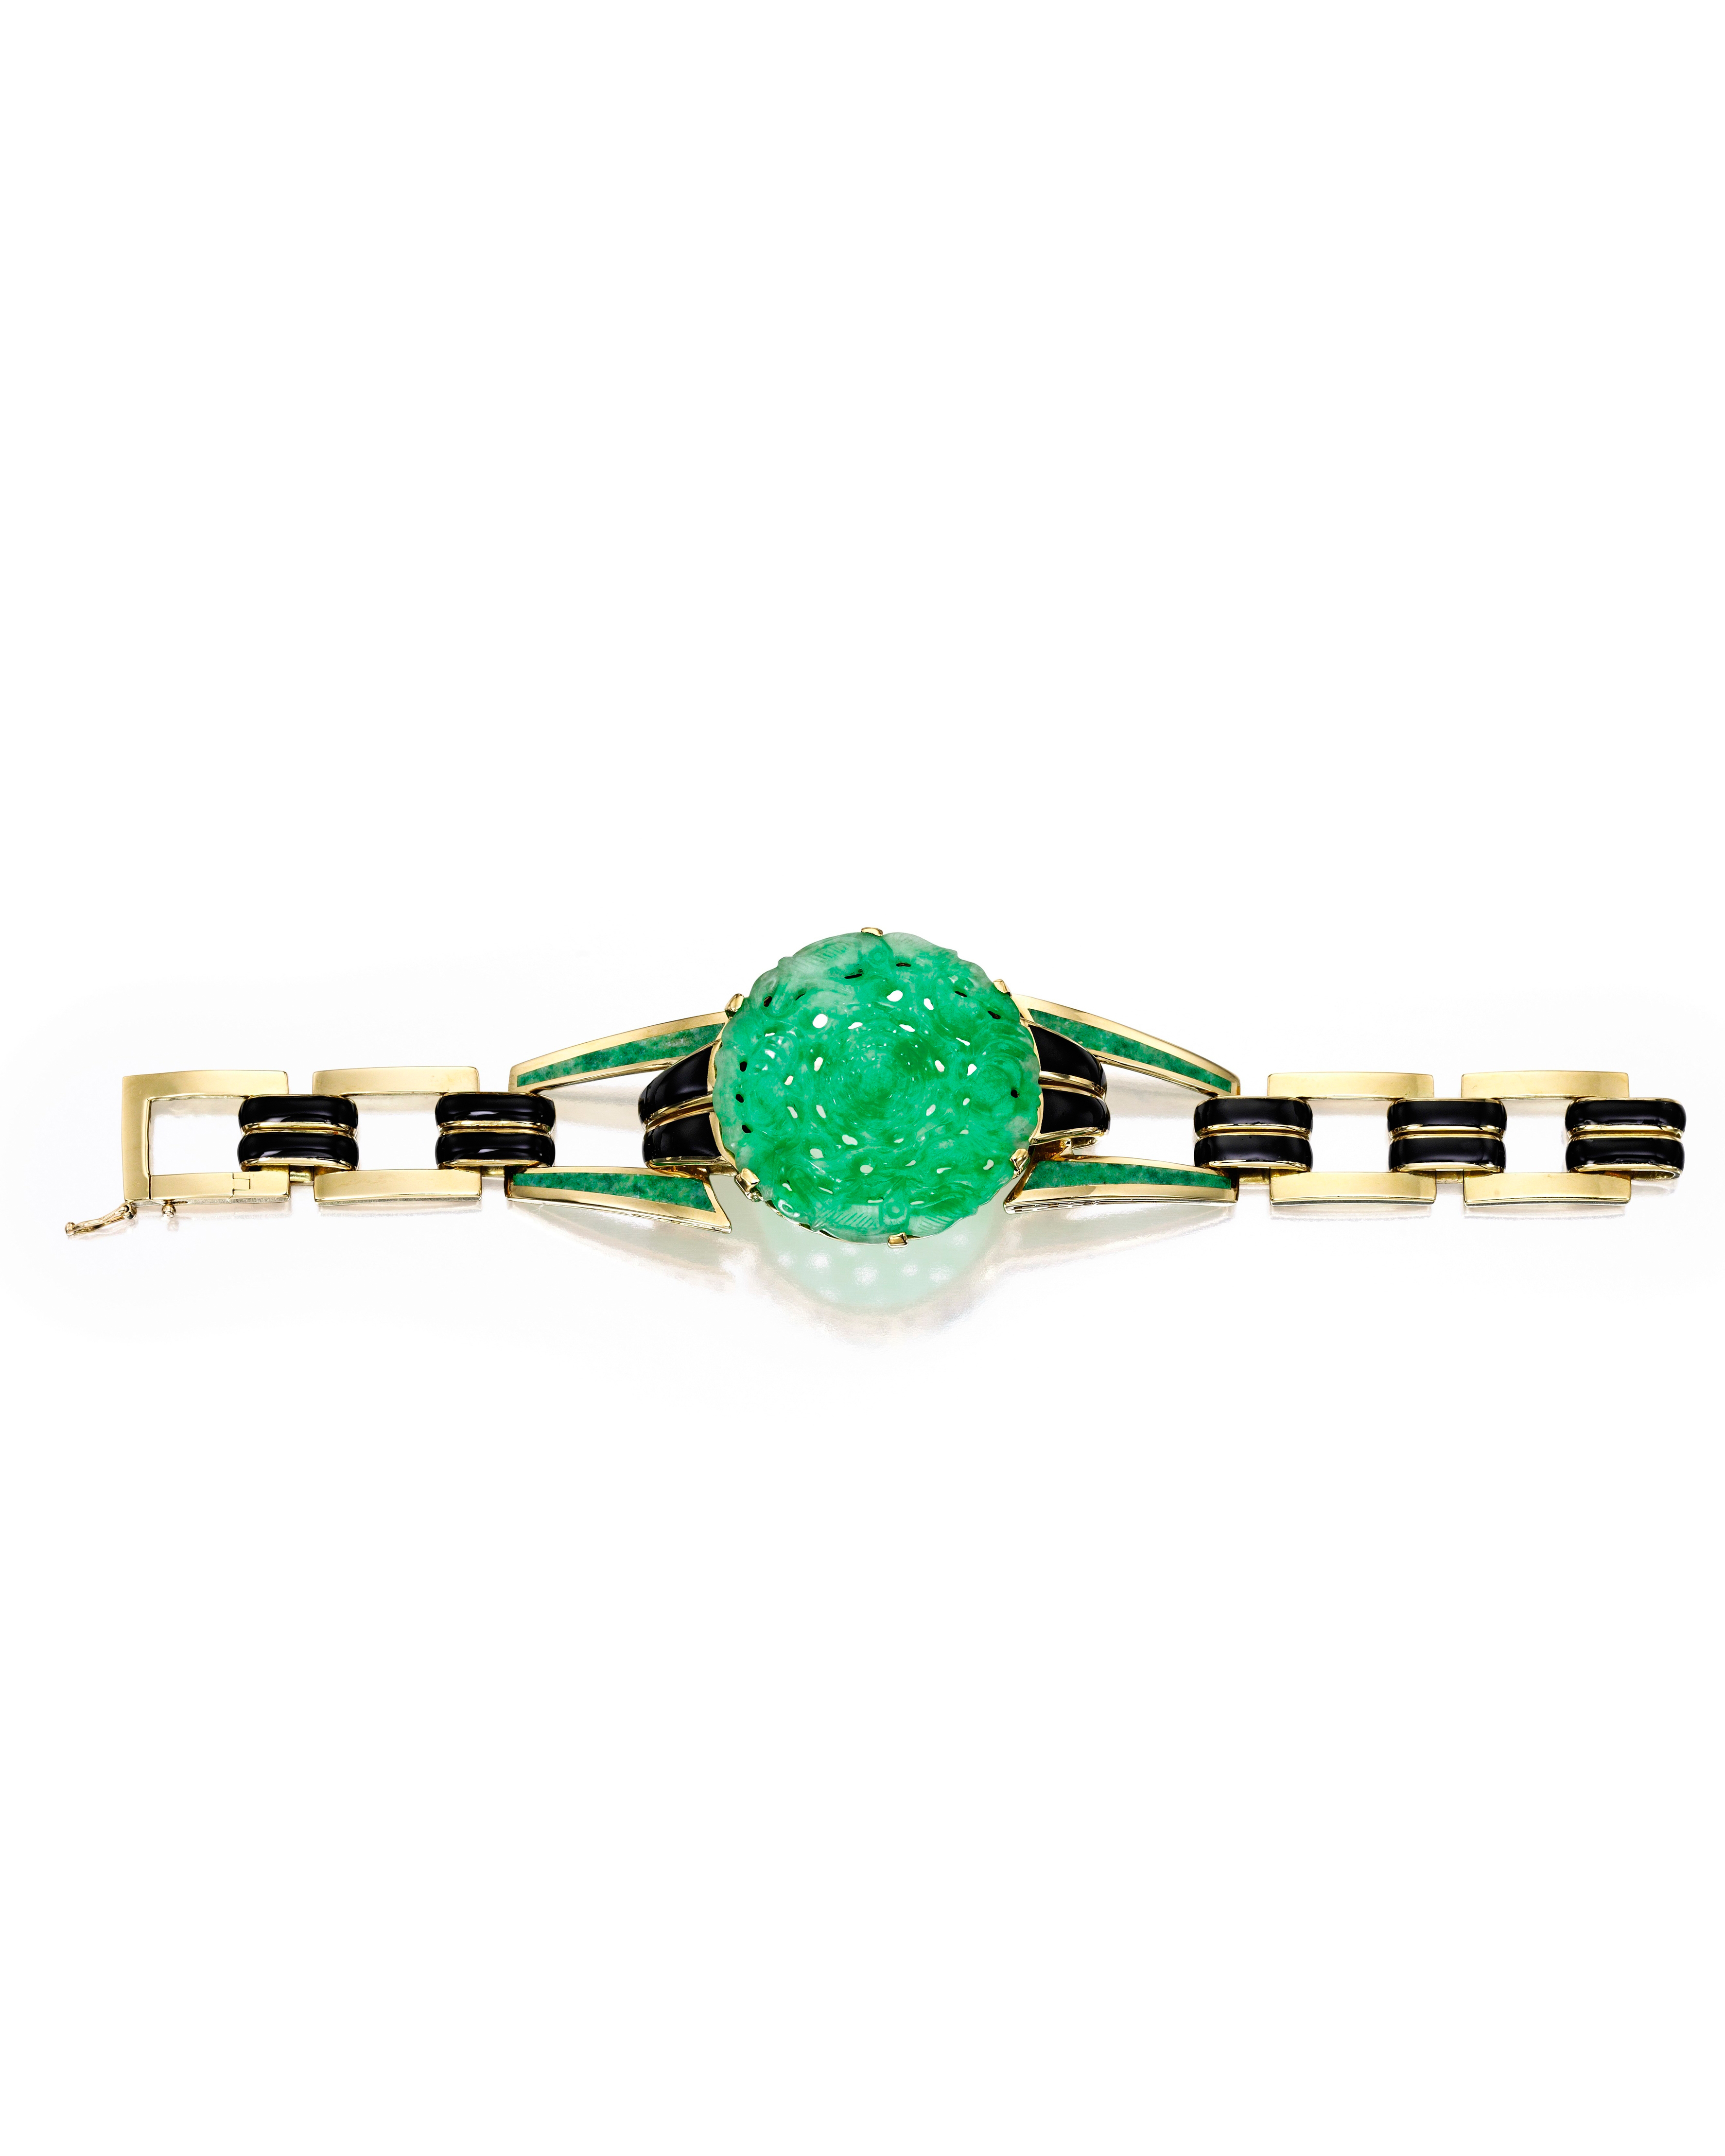 sothebys-ebay-auction-9331-lot-208-0415.jpg